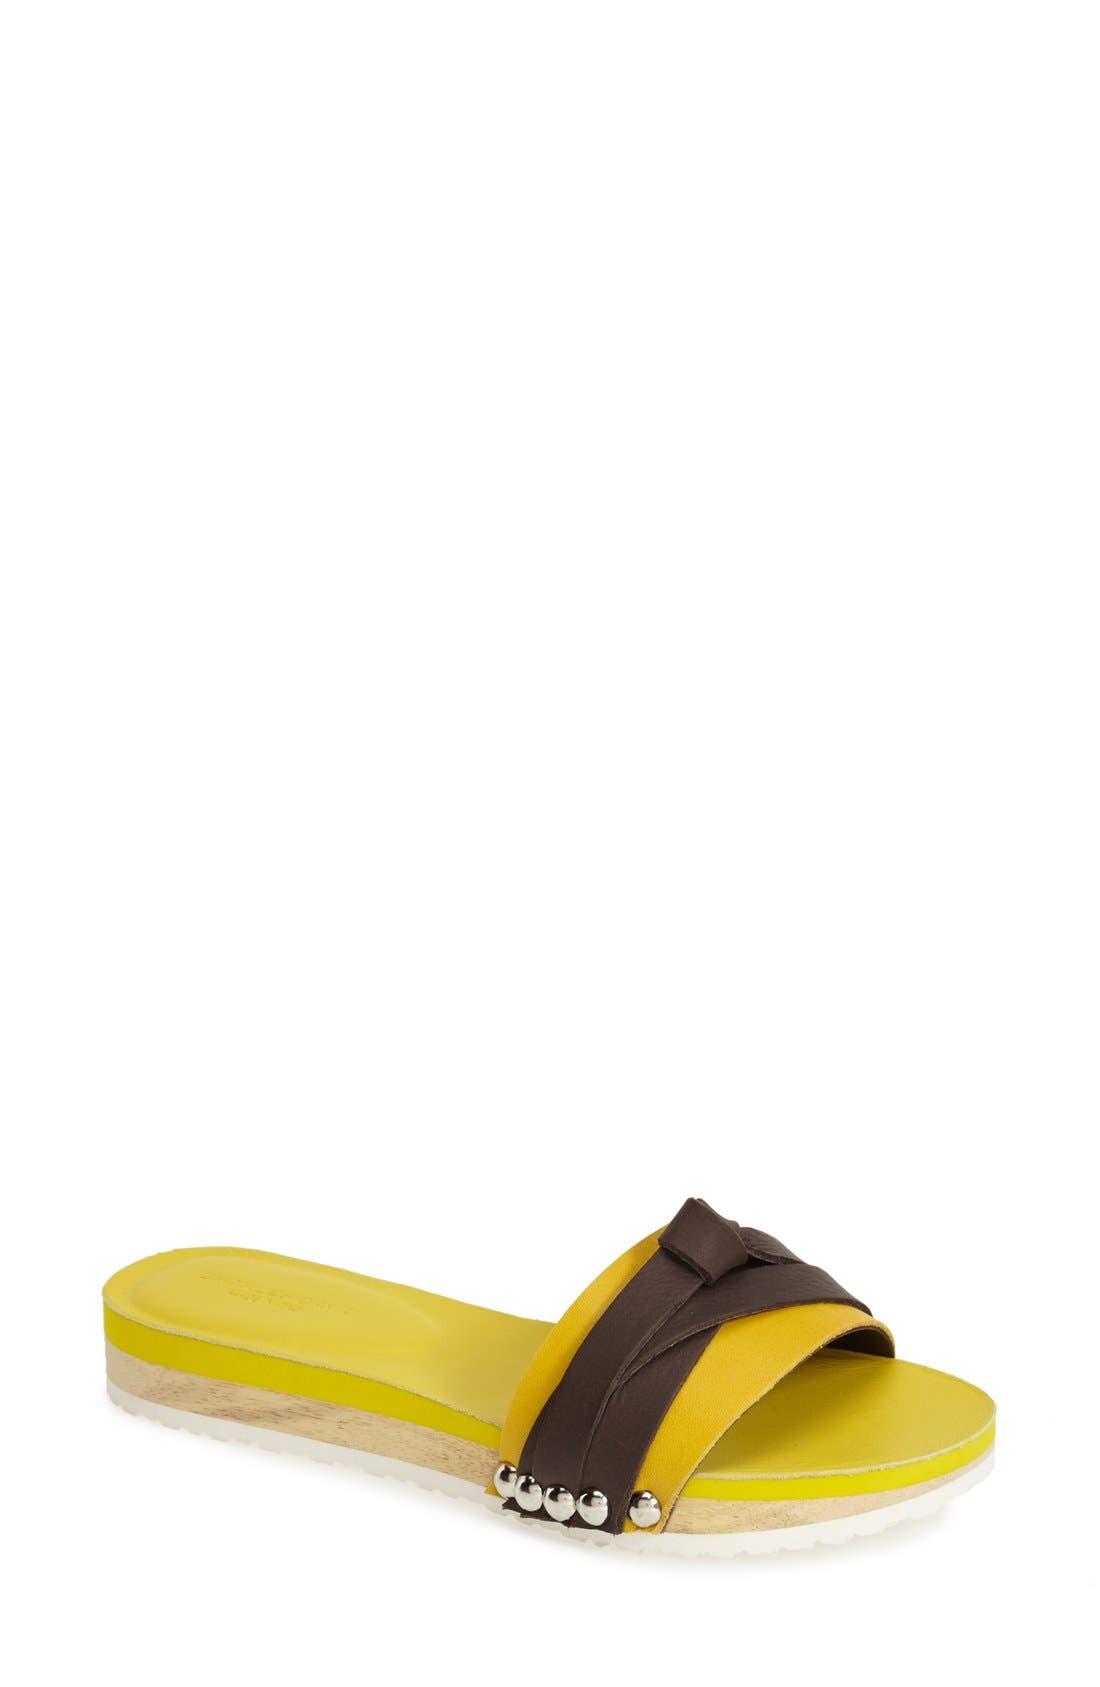 Main Image - Charles David 'Becket' Slide Sandal (Women)